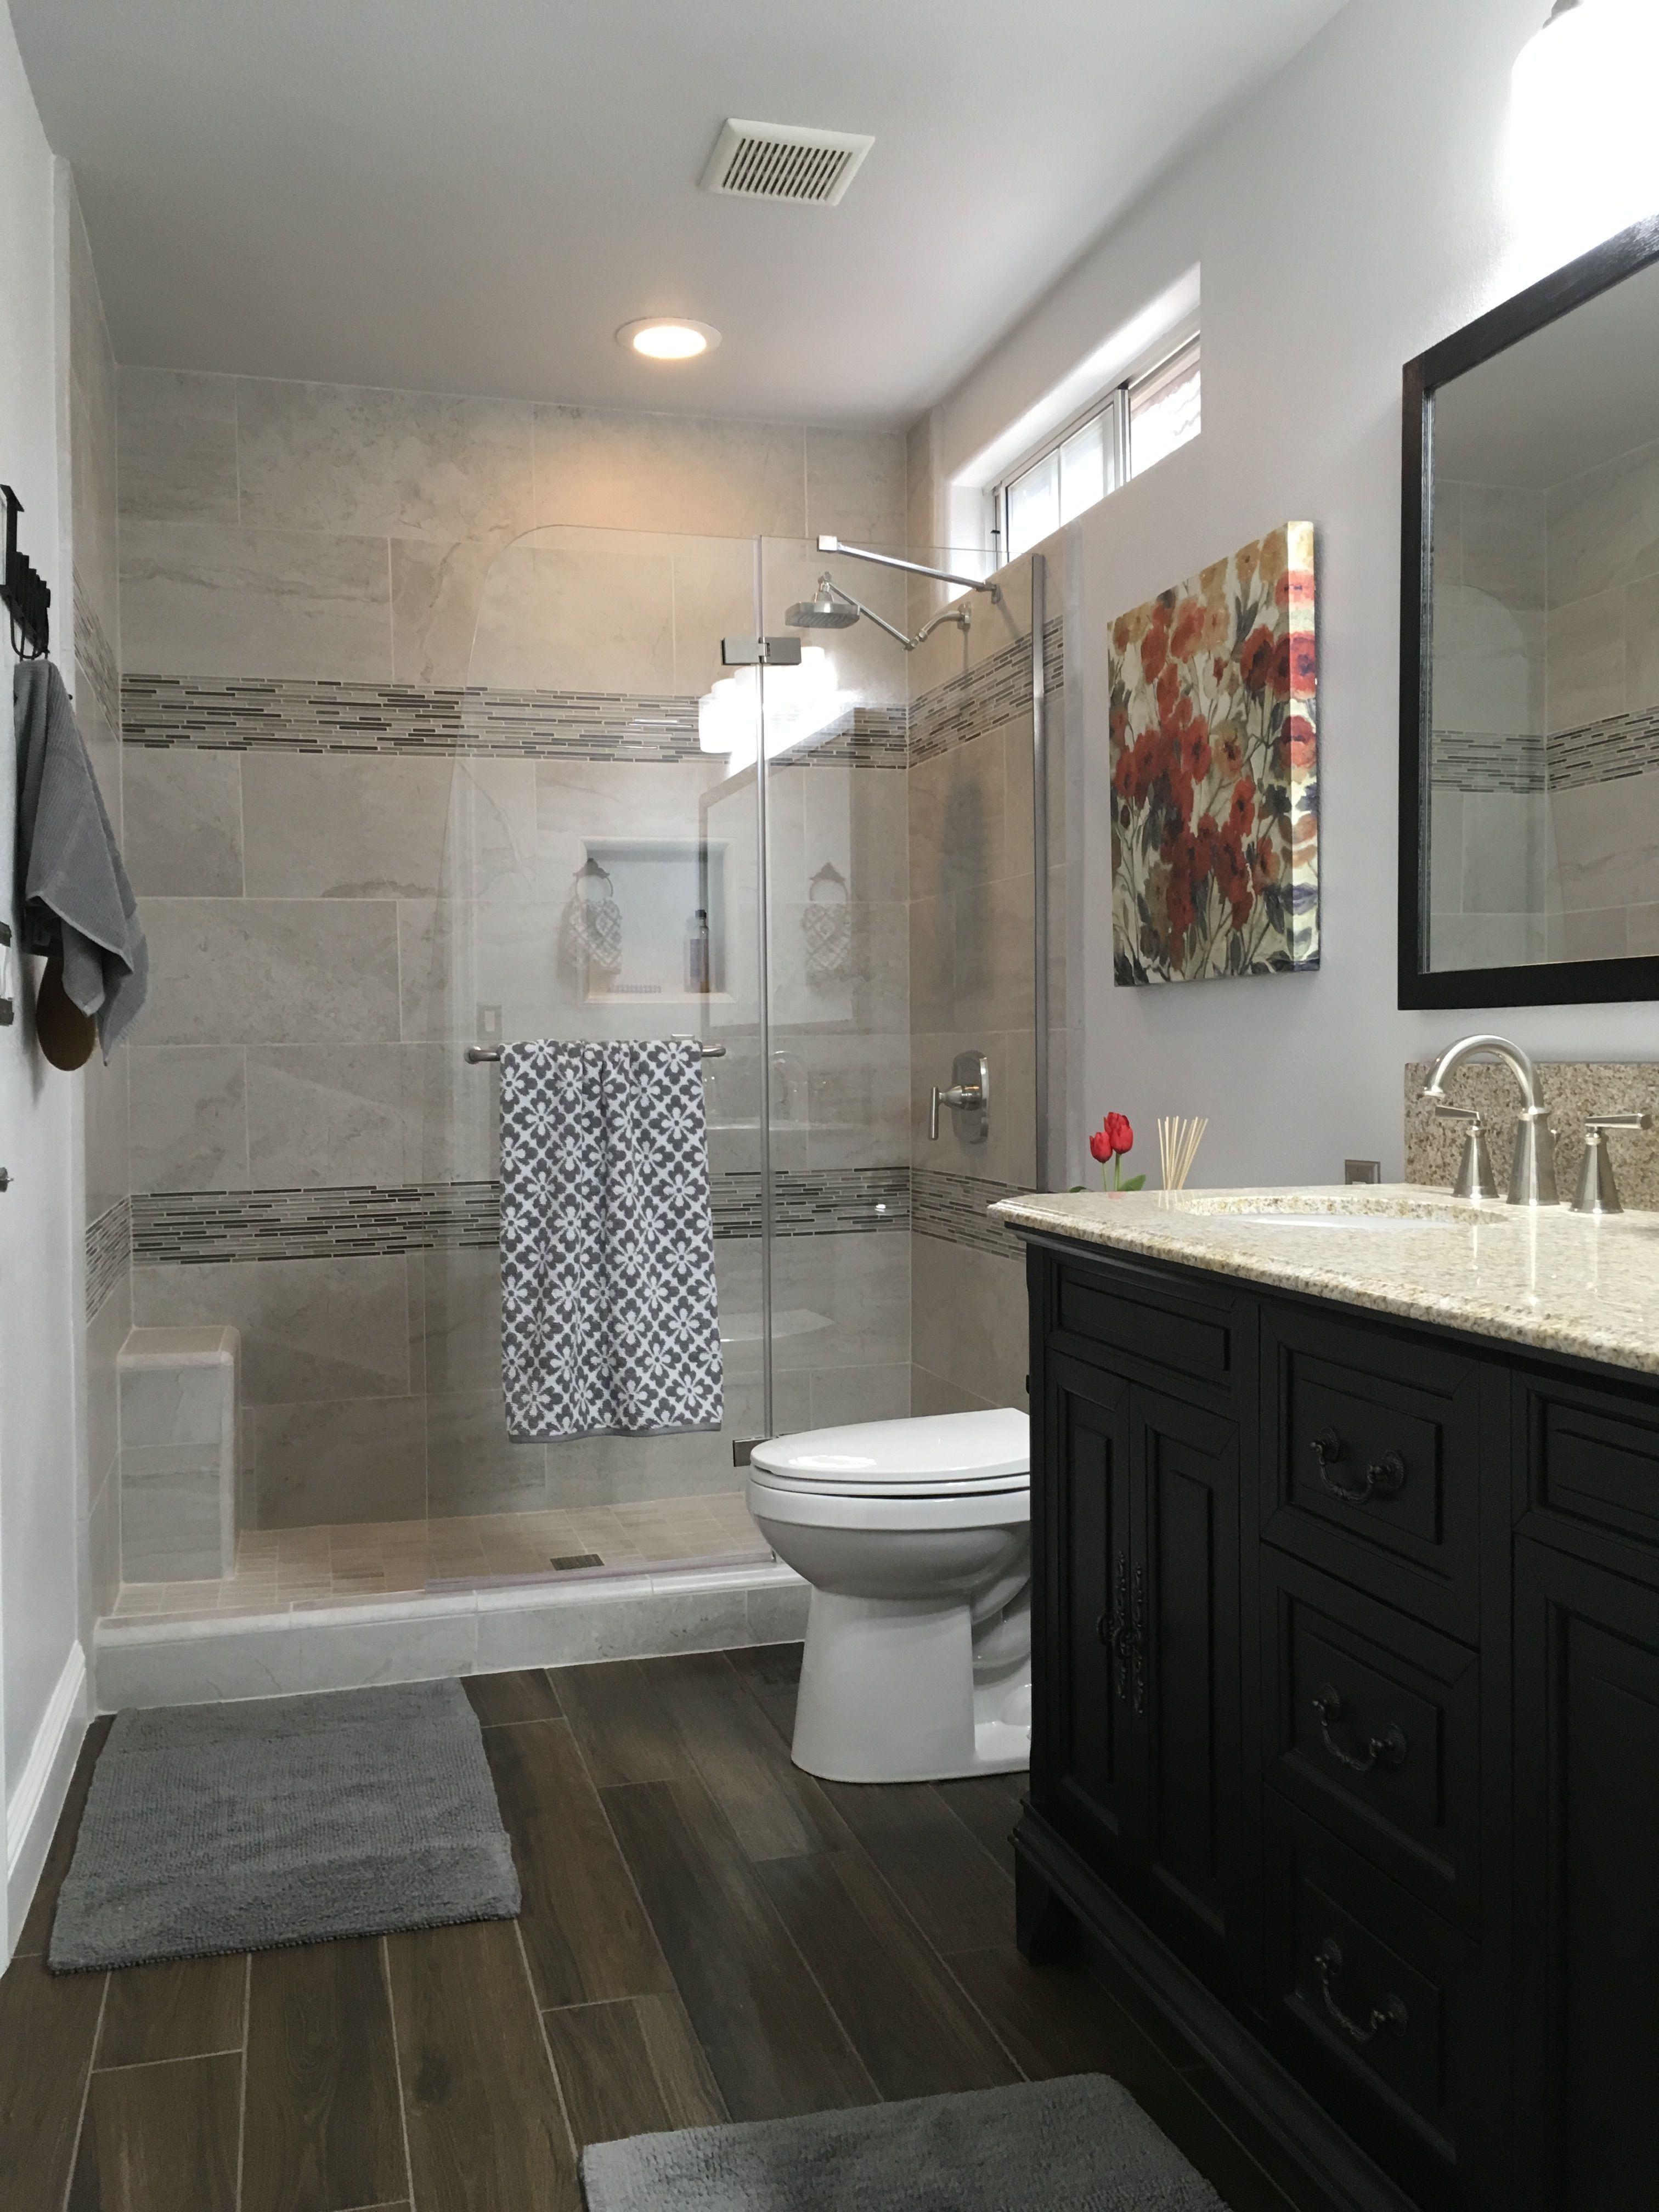 bathtub to walk in shower conversion and remodel rh pinterest com